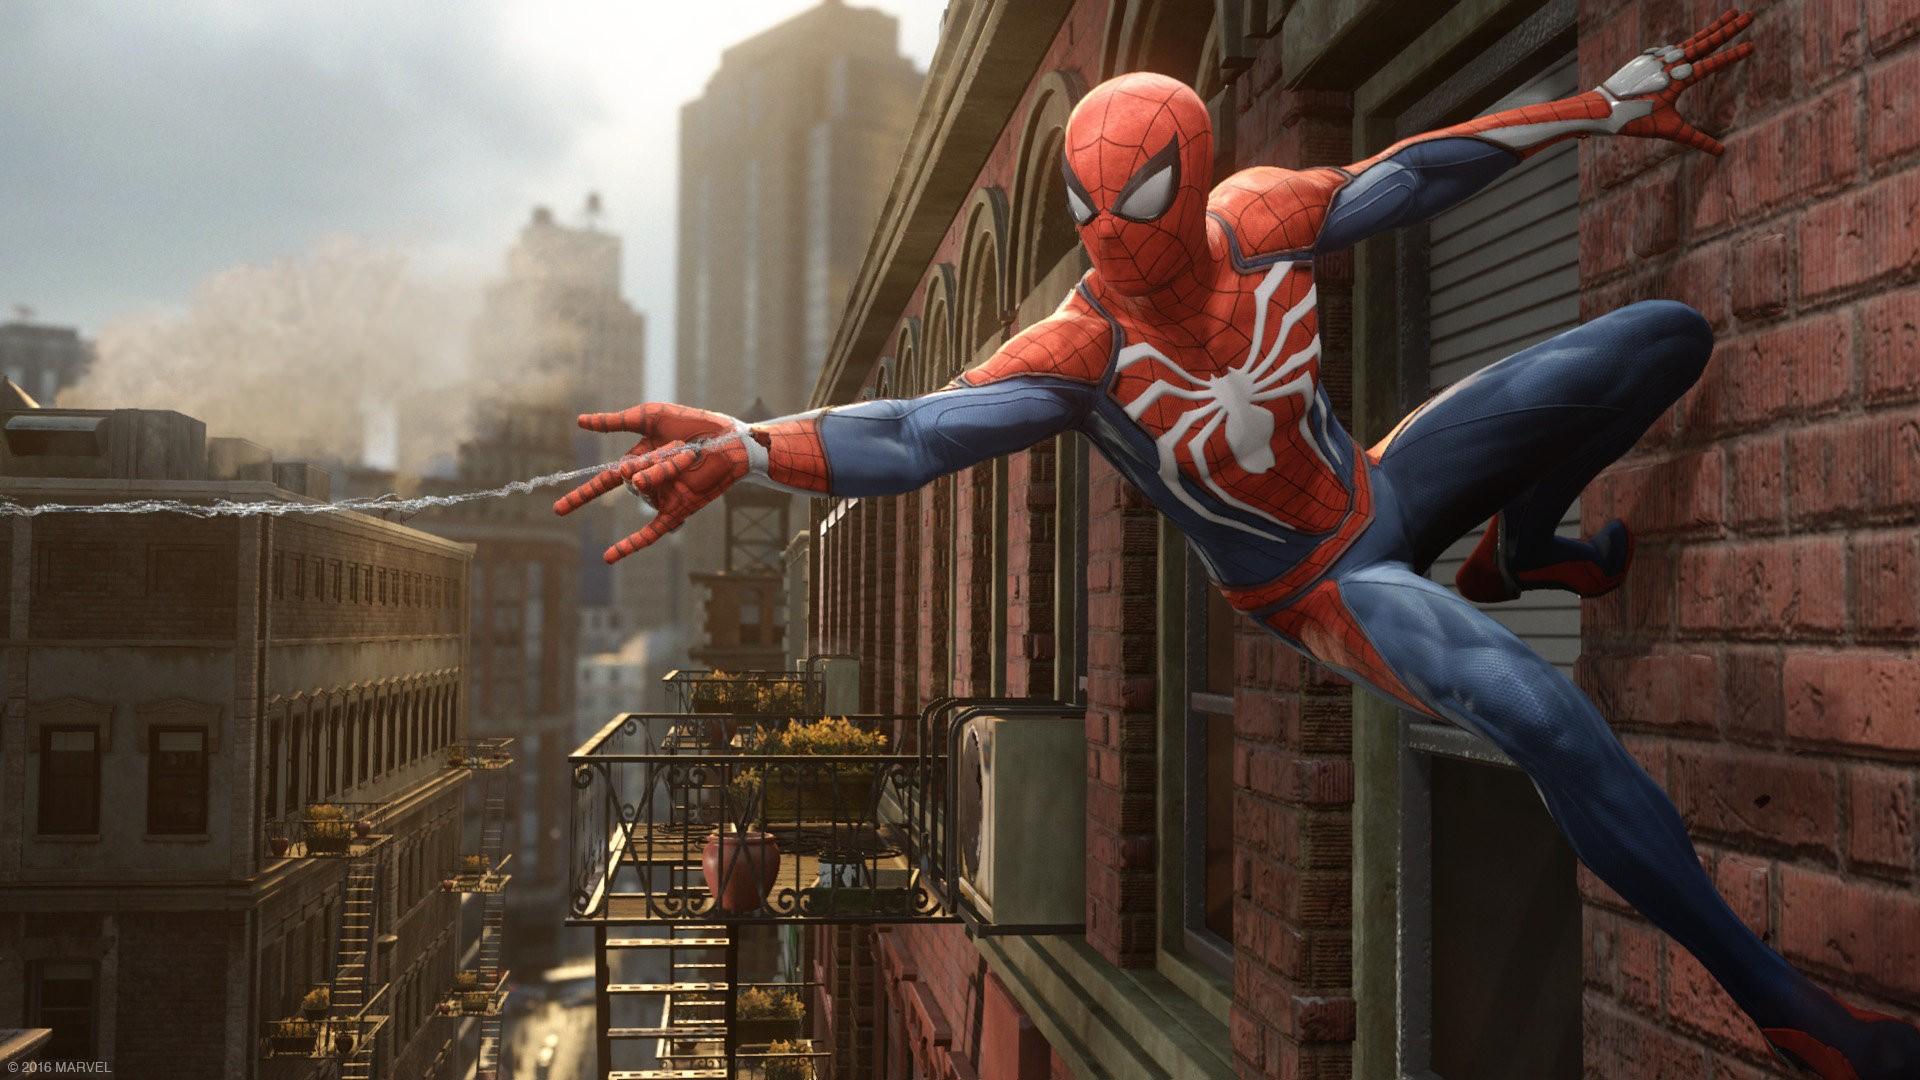 A fost lansat un nou trailer pentru Spider-Man